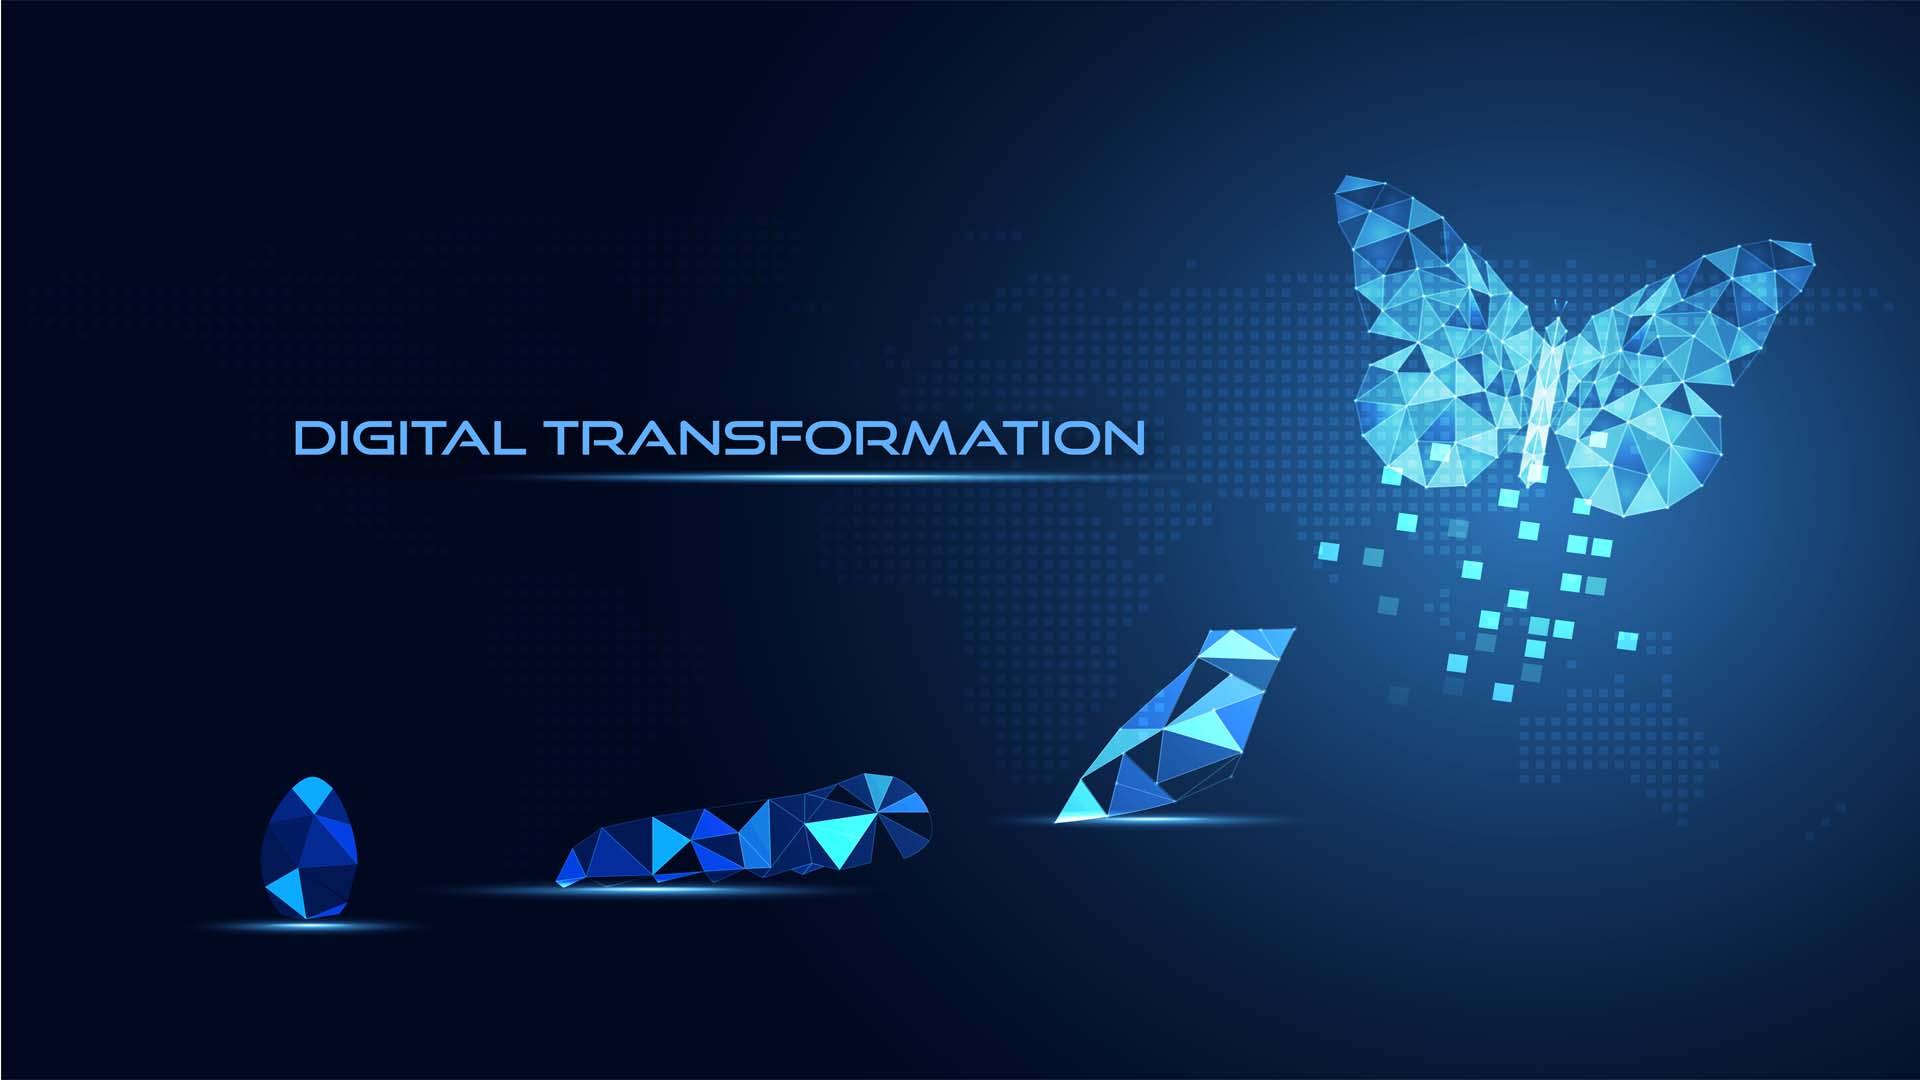 Your Company's Digital Transformation